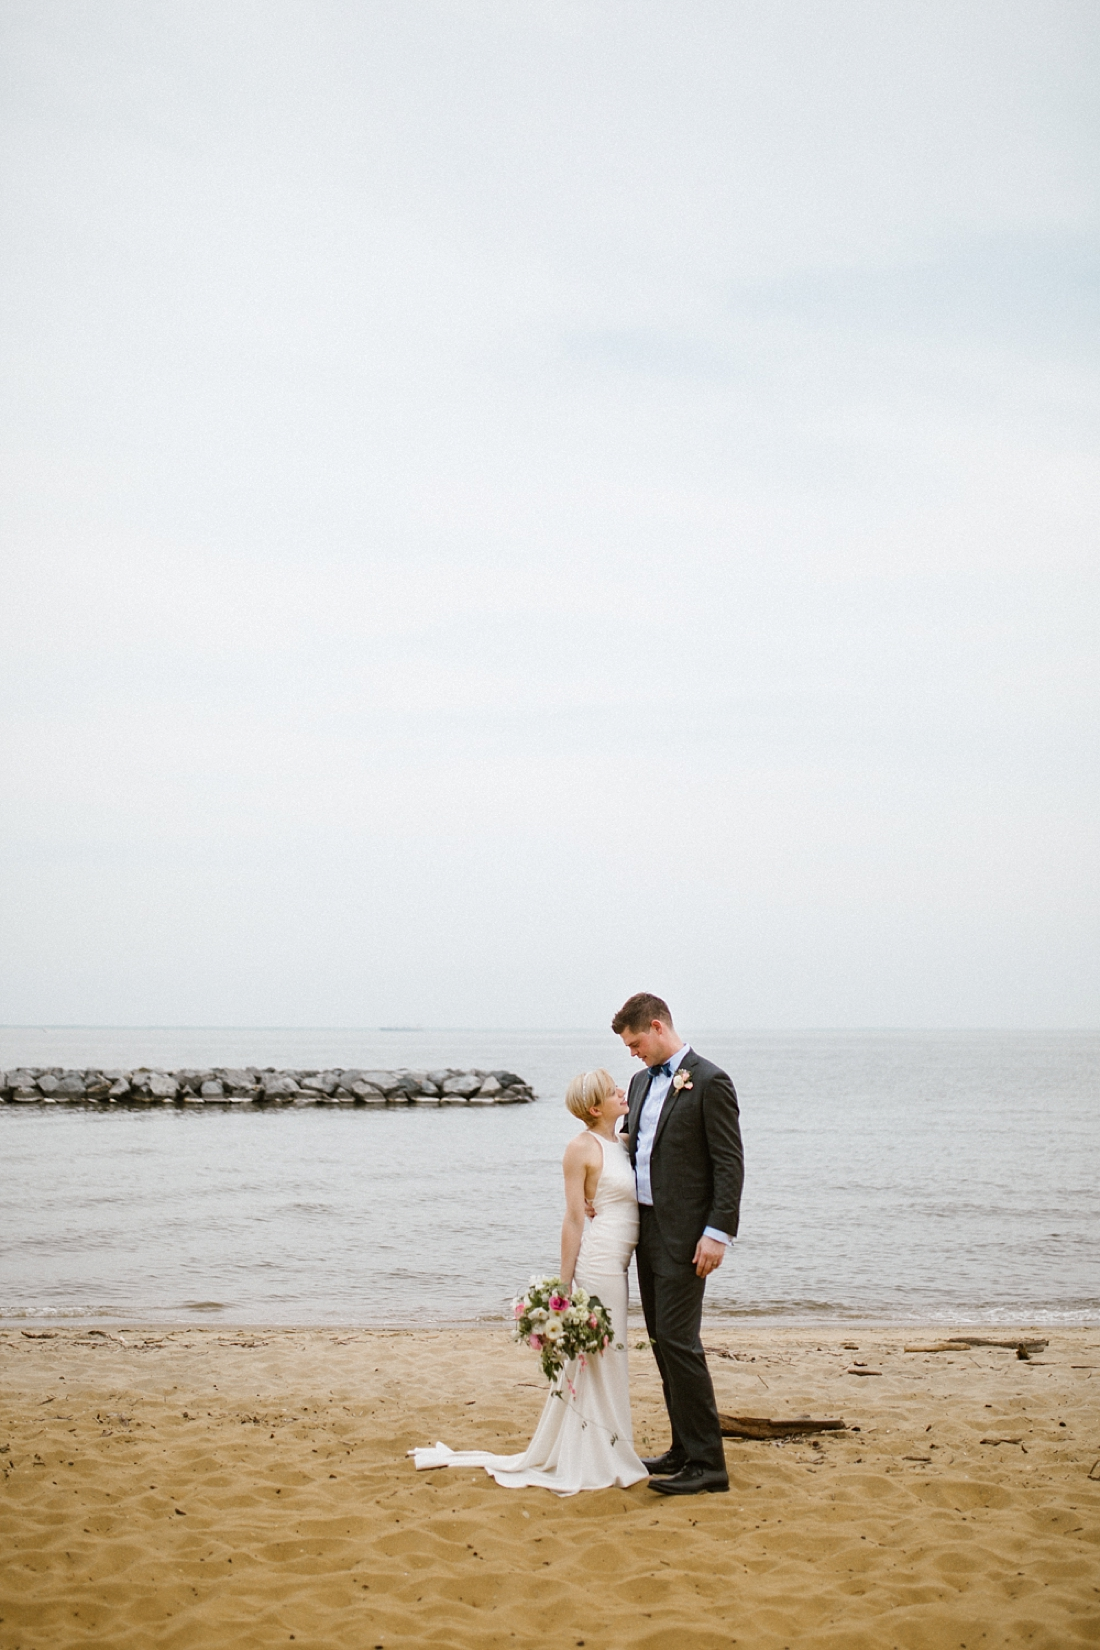 Marryland Weddings Earthy Neutrals Wedding at Chesapeake Bay Foundation Victoria Selman Photography_1019.jpg